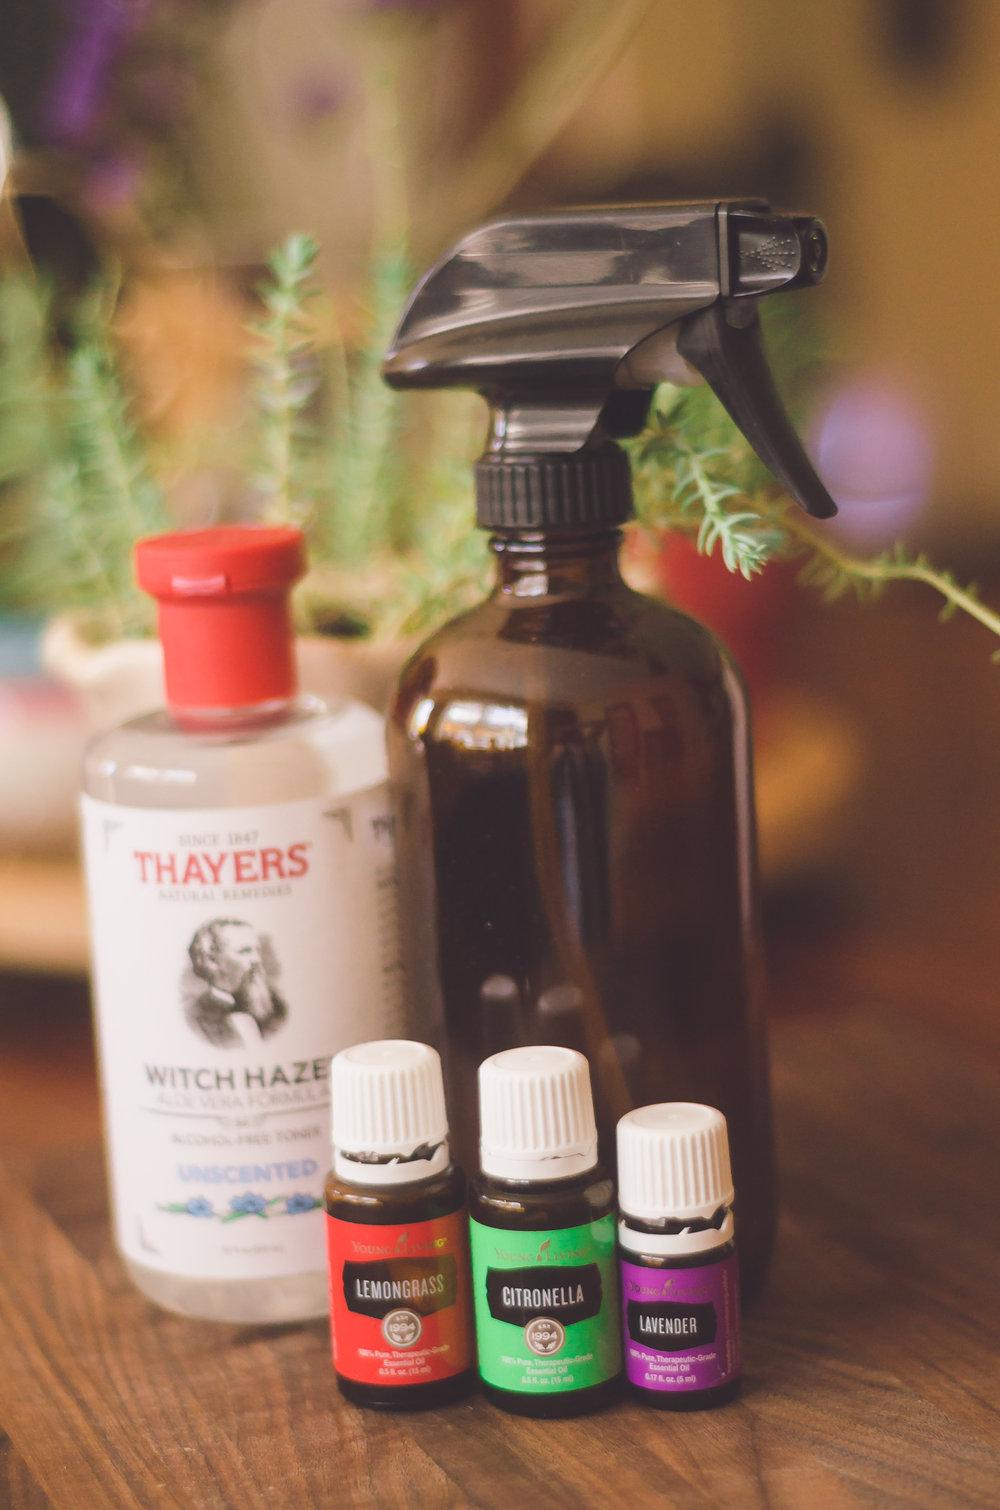 DIY Bug Spray - Non Toxic & Safe for Kids - She Got Guts